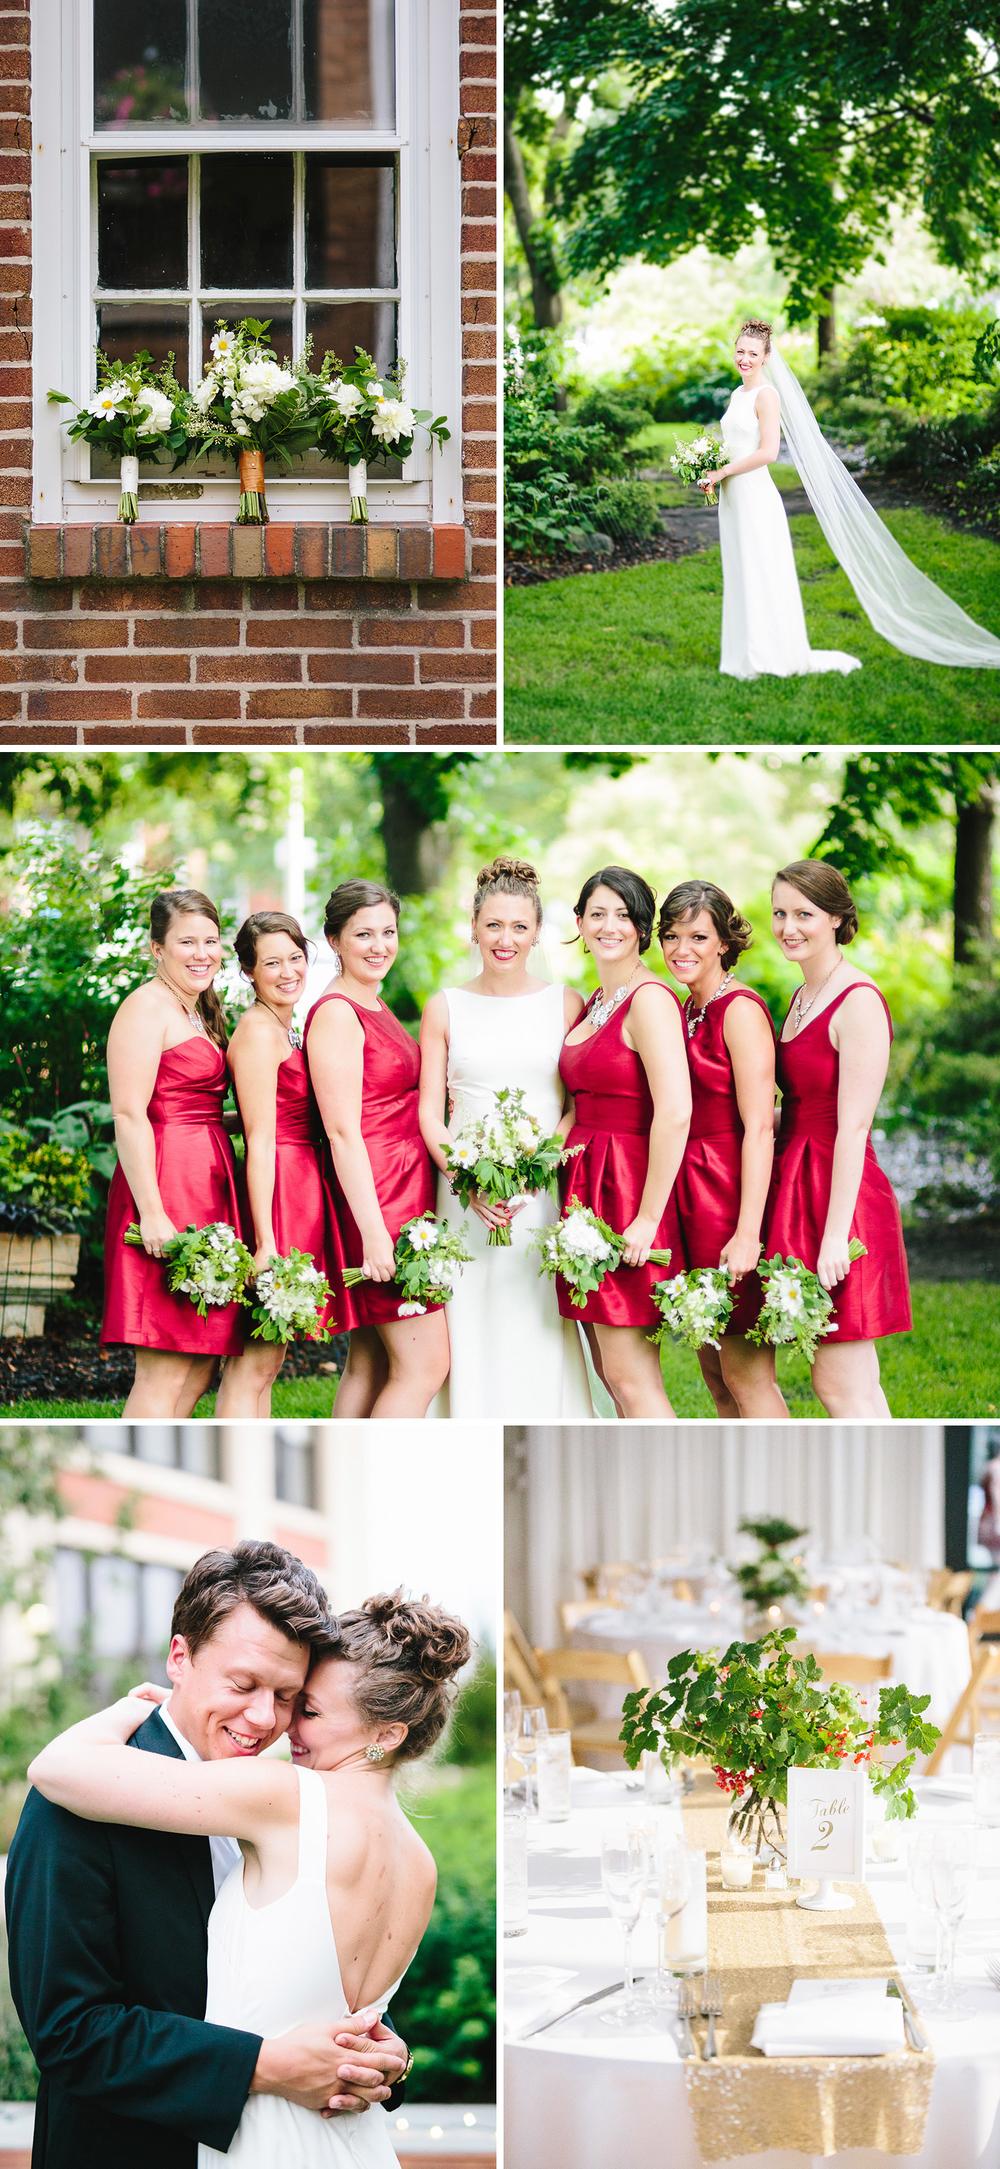 Chicago_Fine_Art_Wedding_Photography_hh.jpg